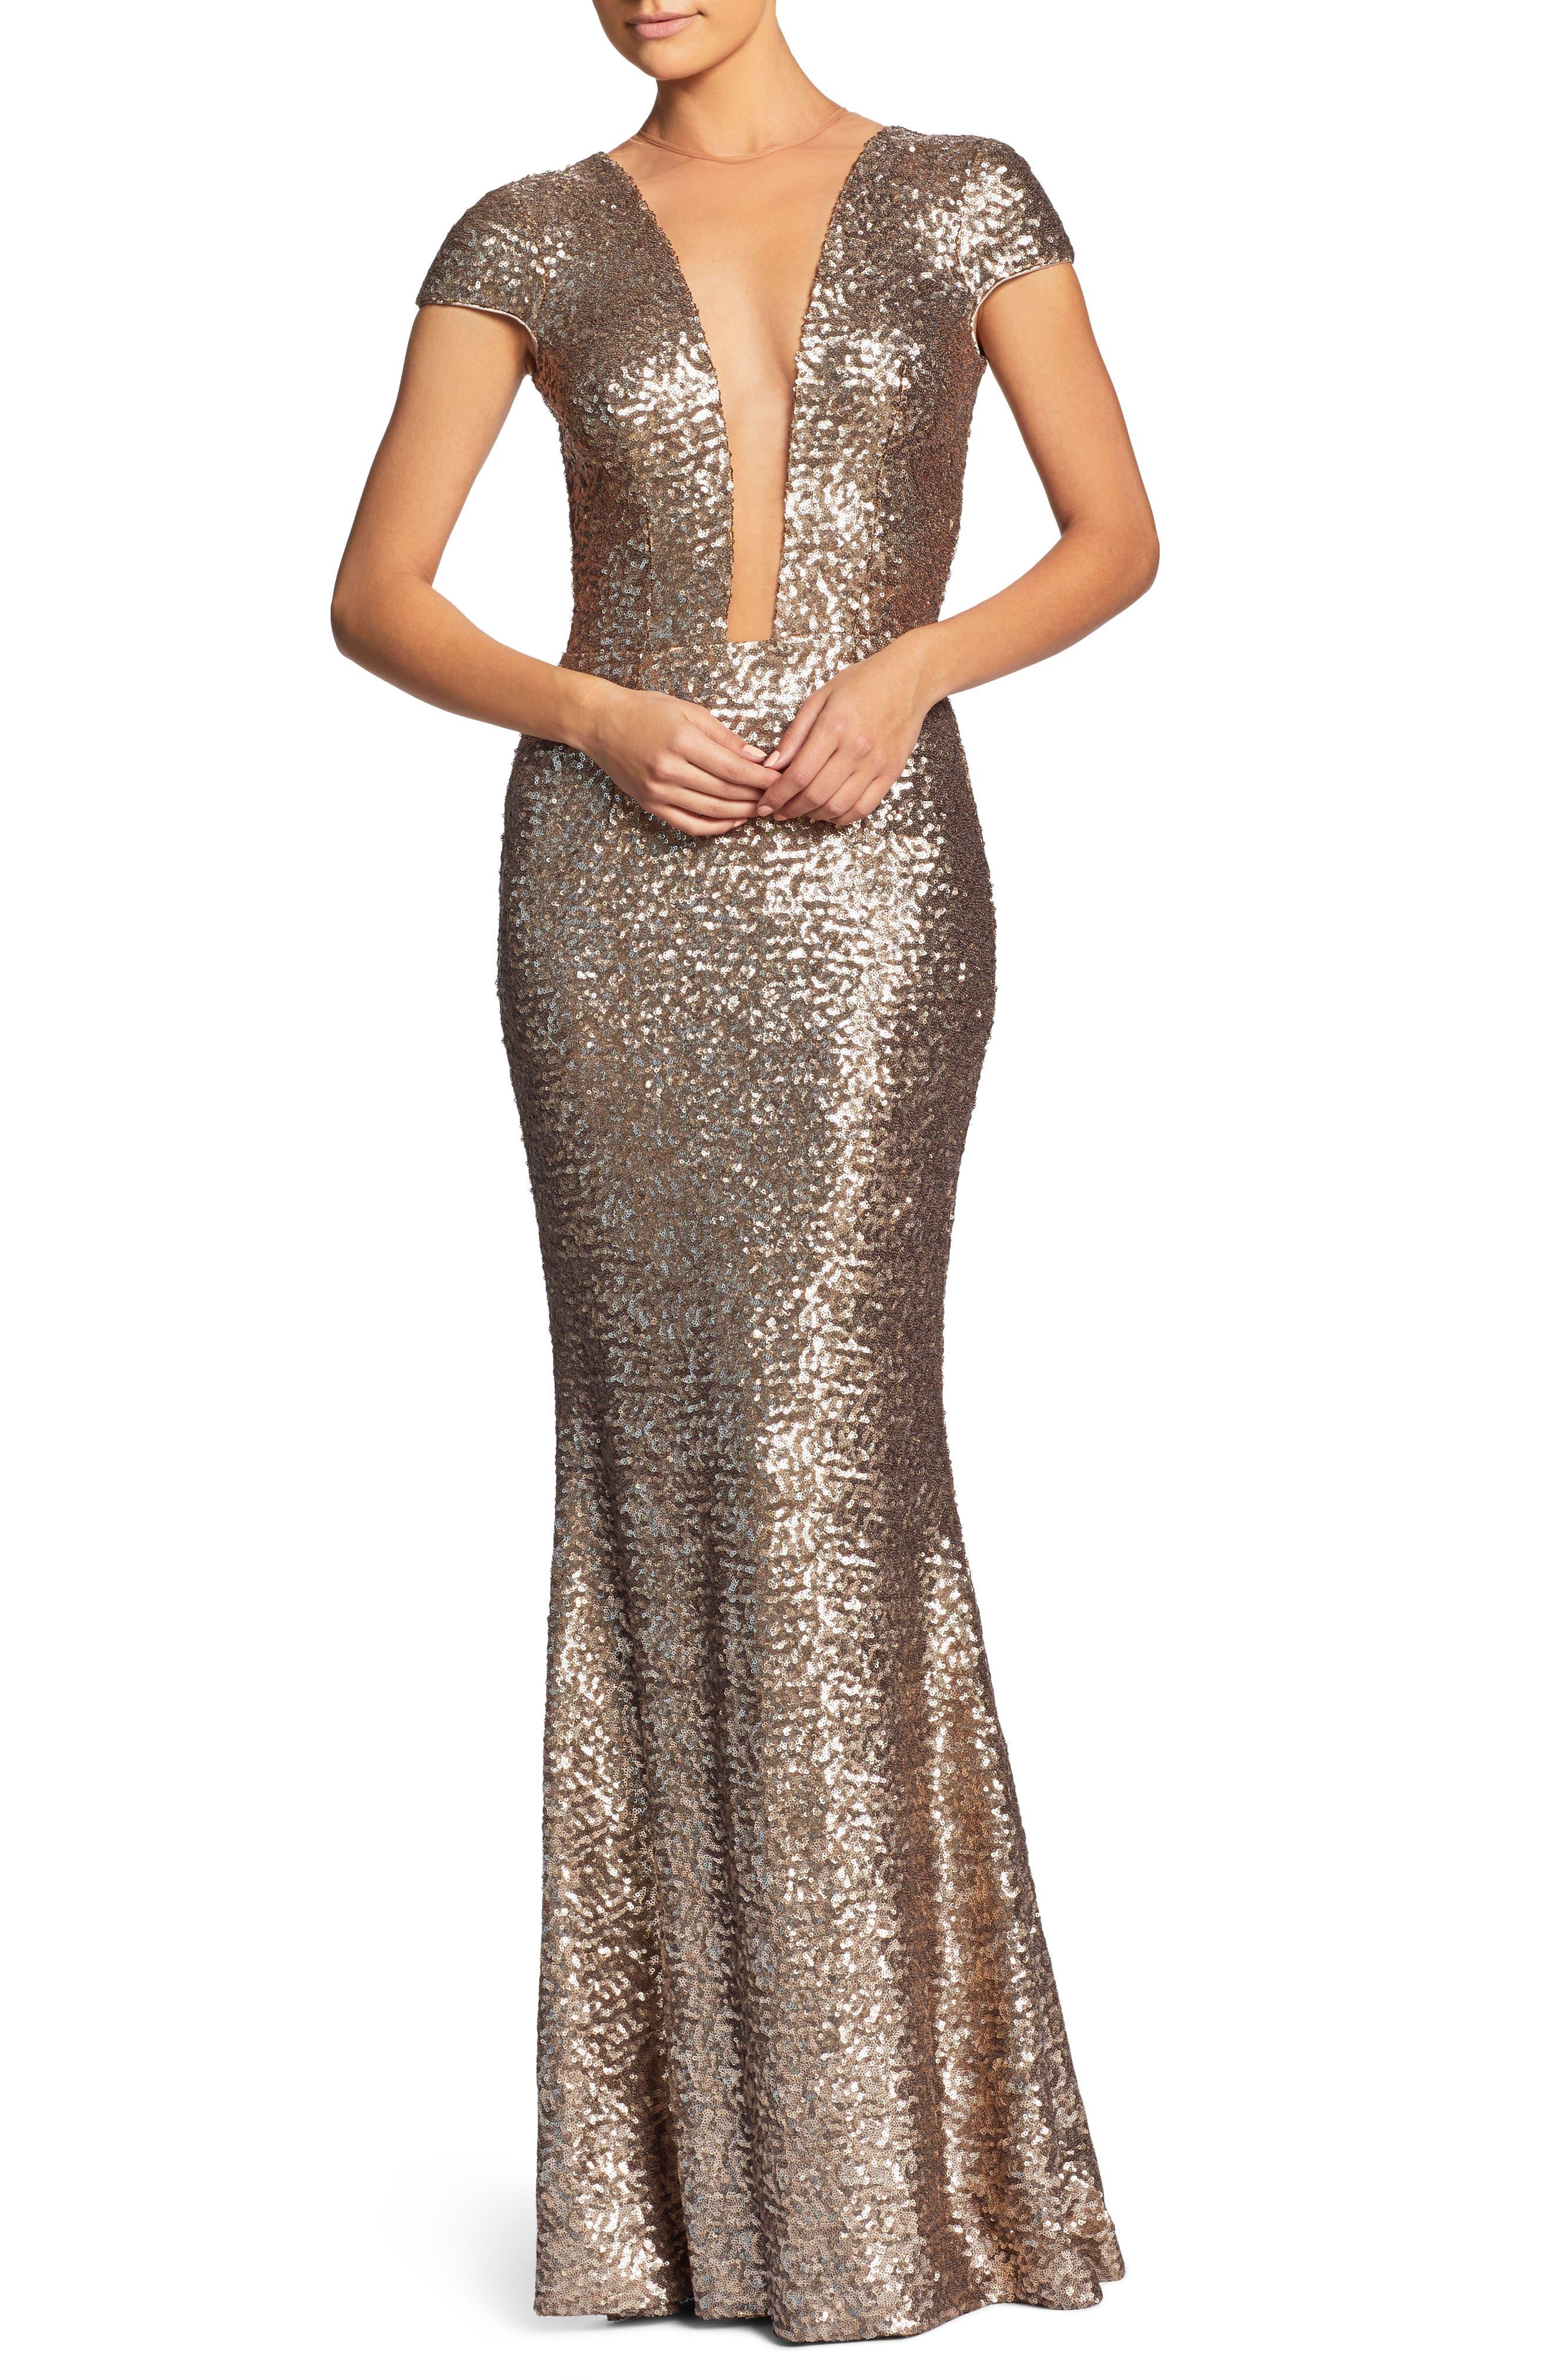 Michelle Sequin Gown,                             Main thumbnail 1, color,                             BRASS